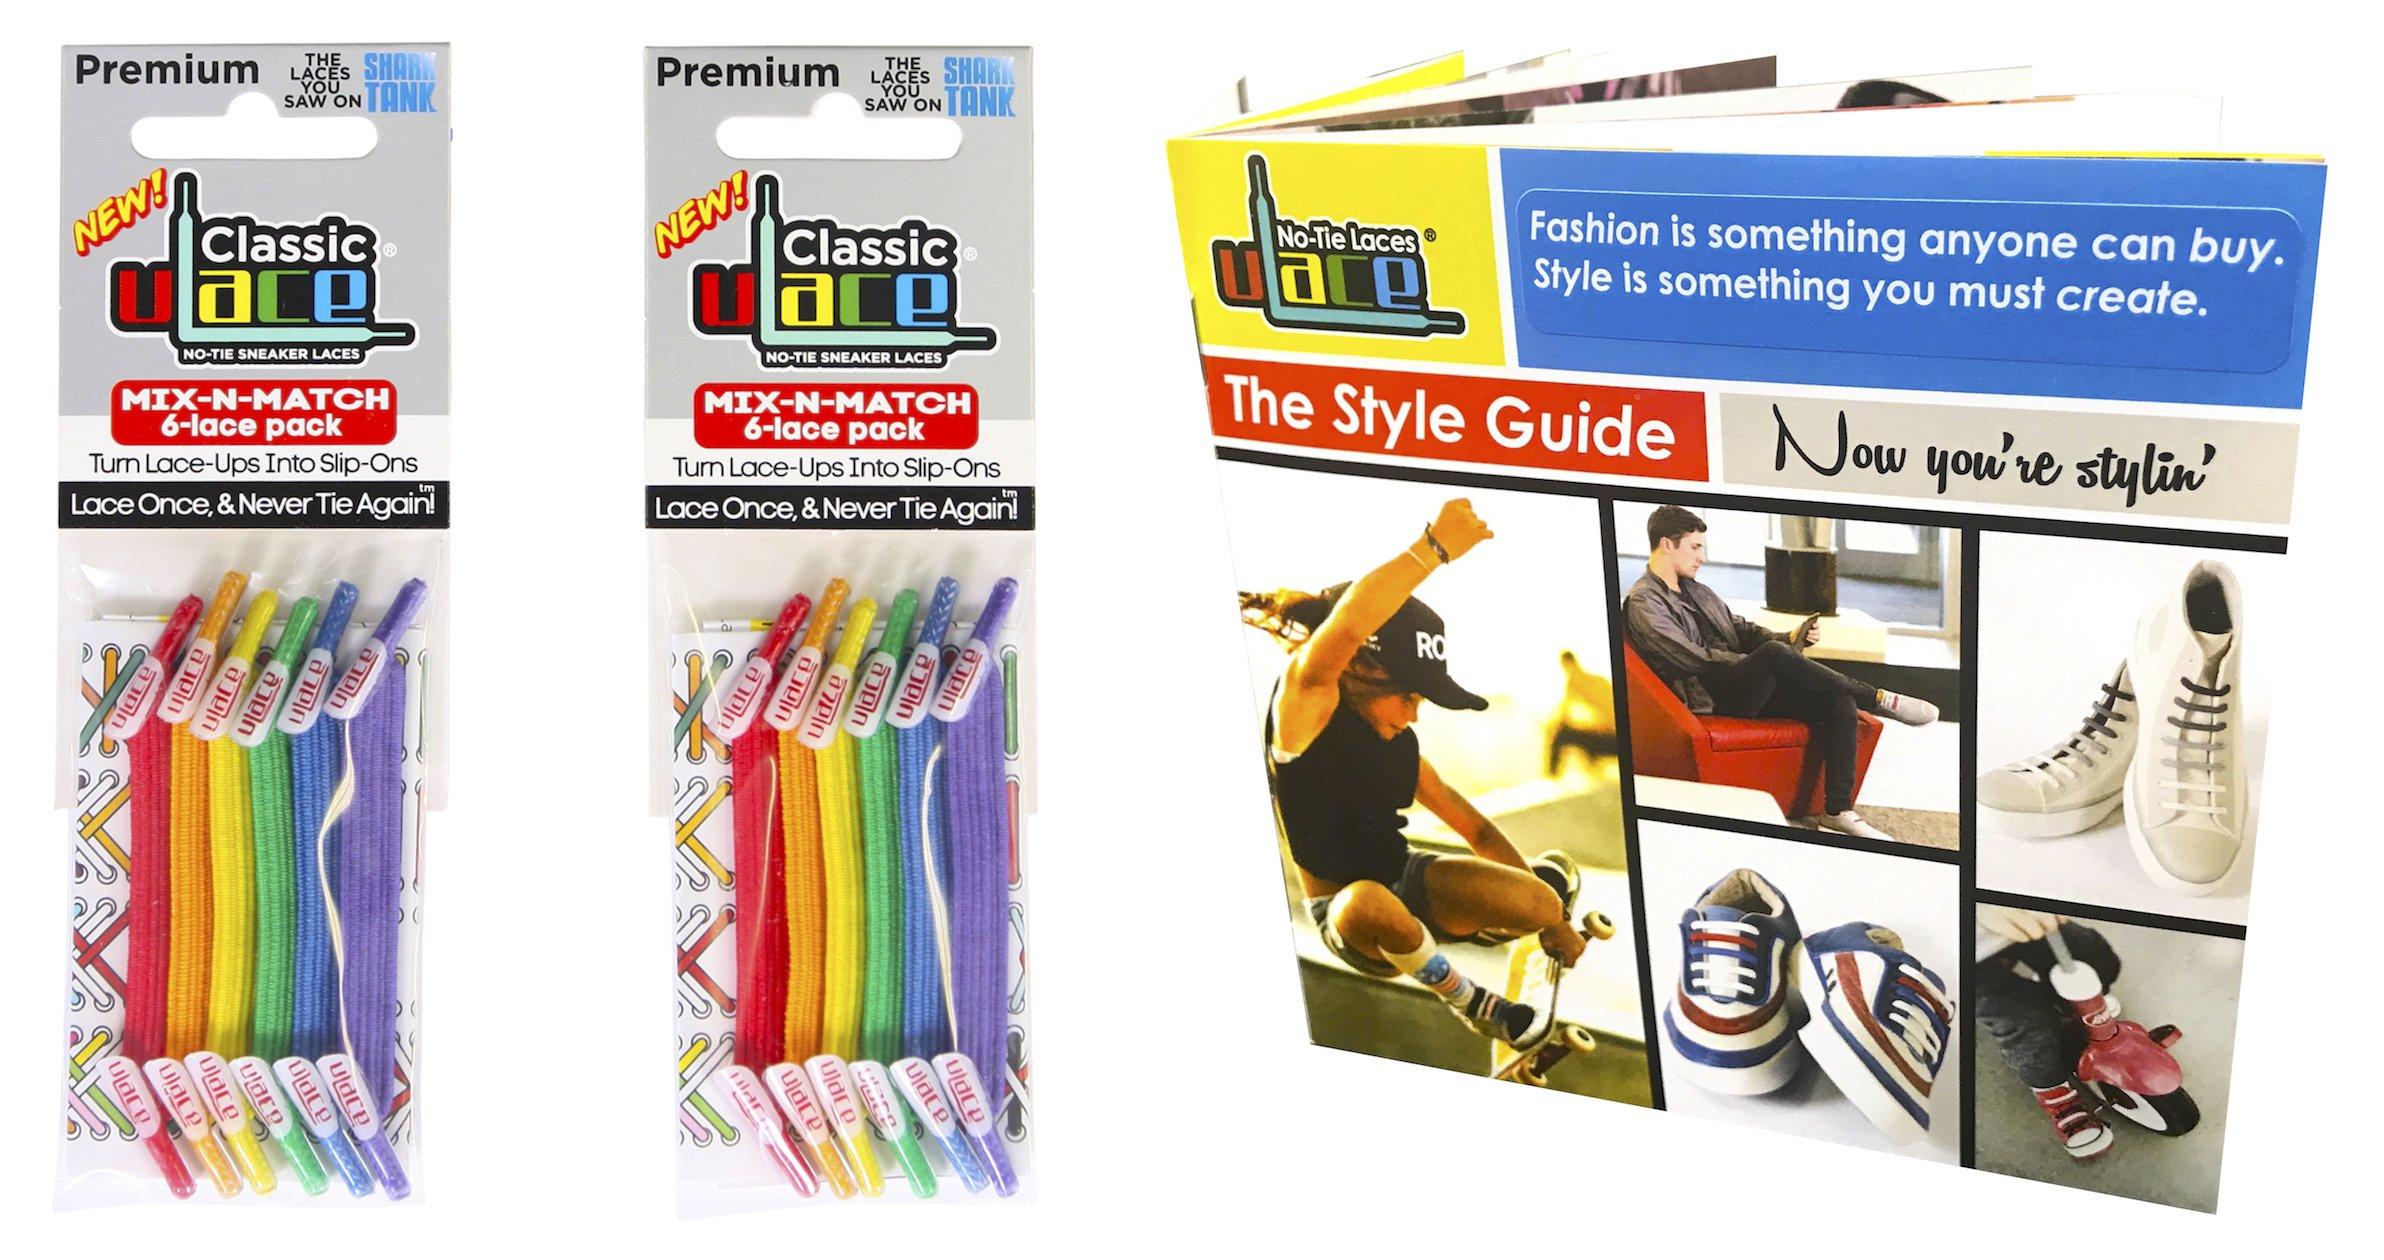 U-Lace Mix-n-Match Classic Bundles - 2 Pack & Style Guide (Rainbow)